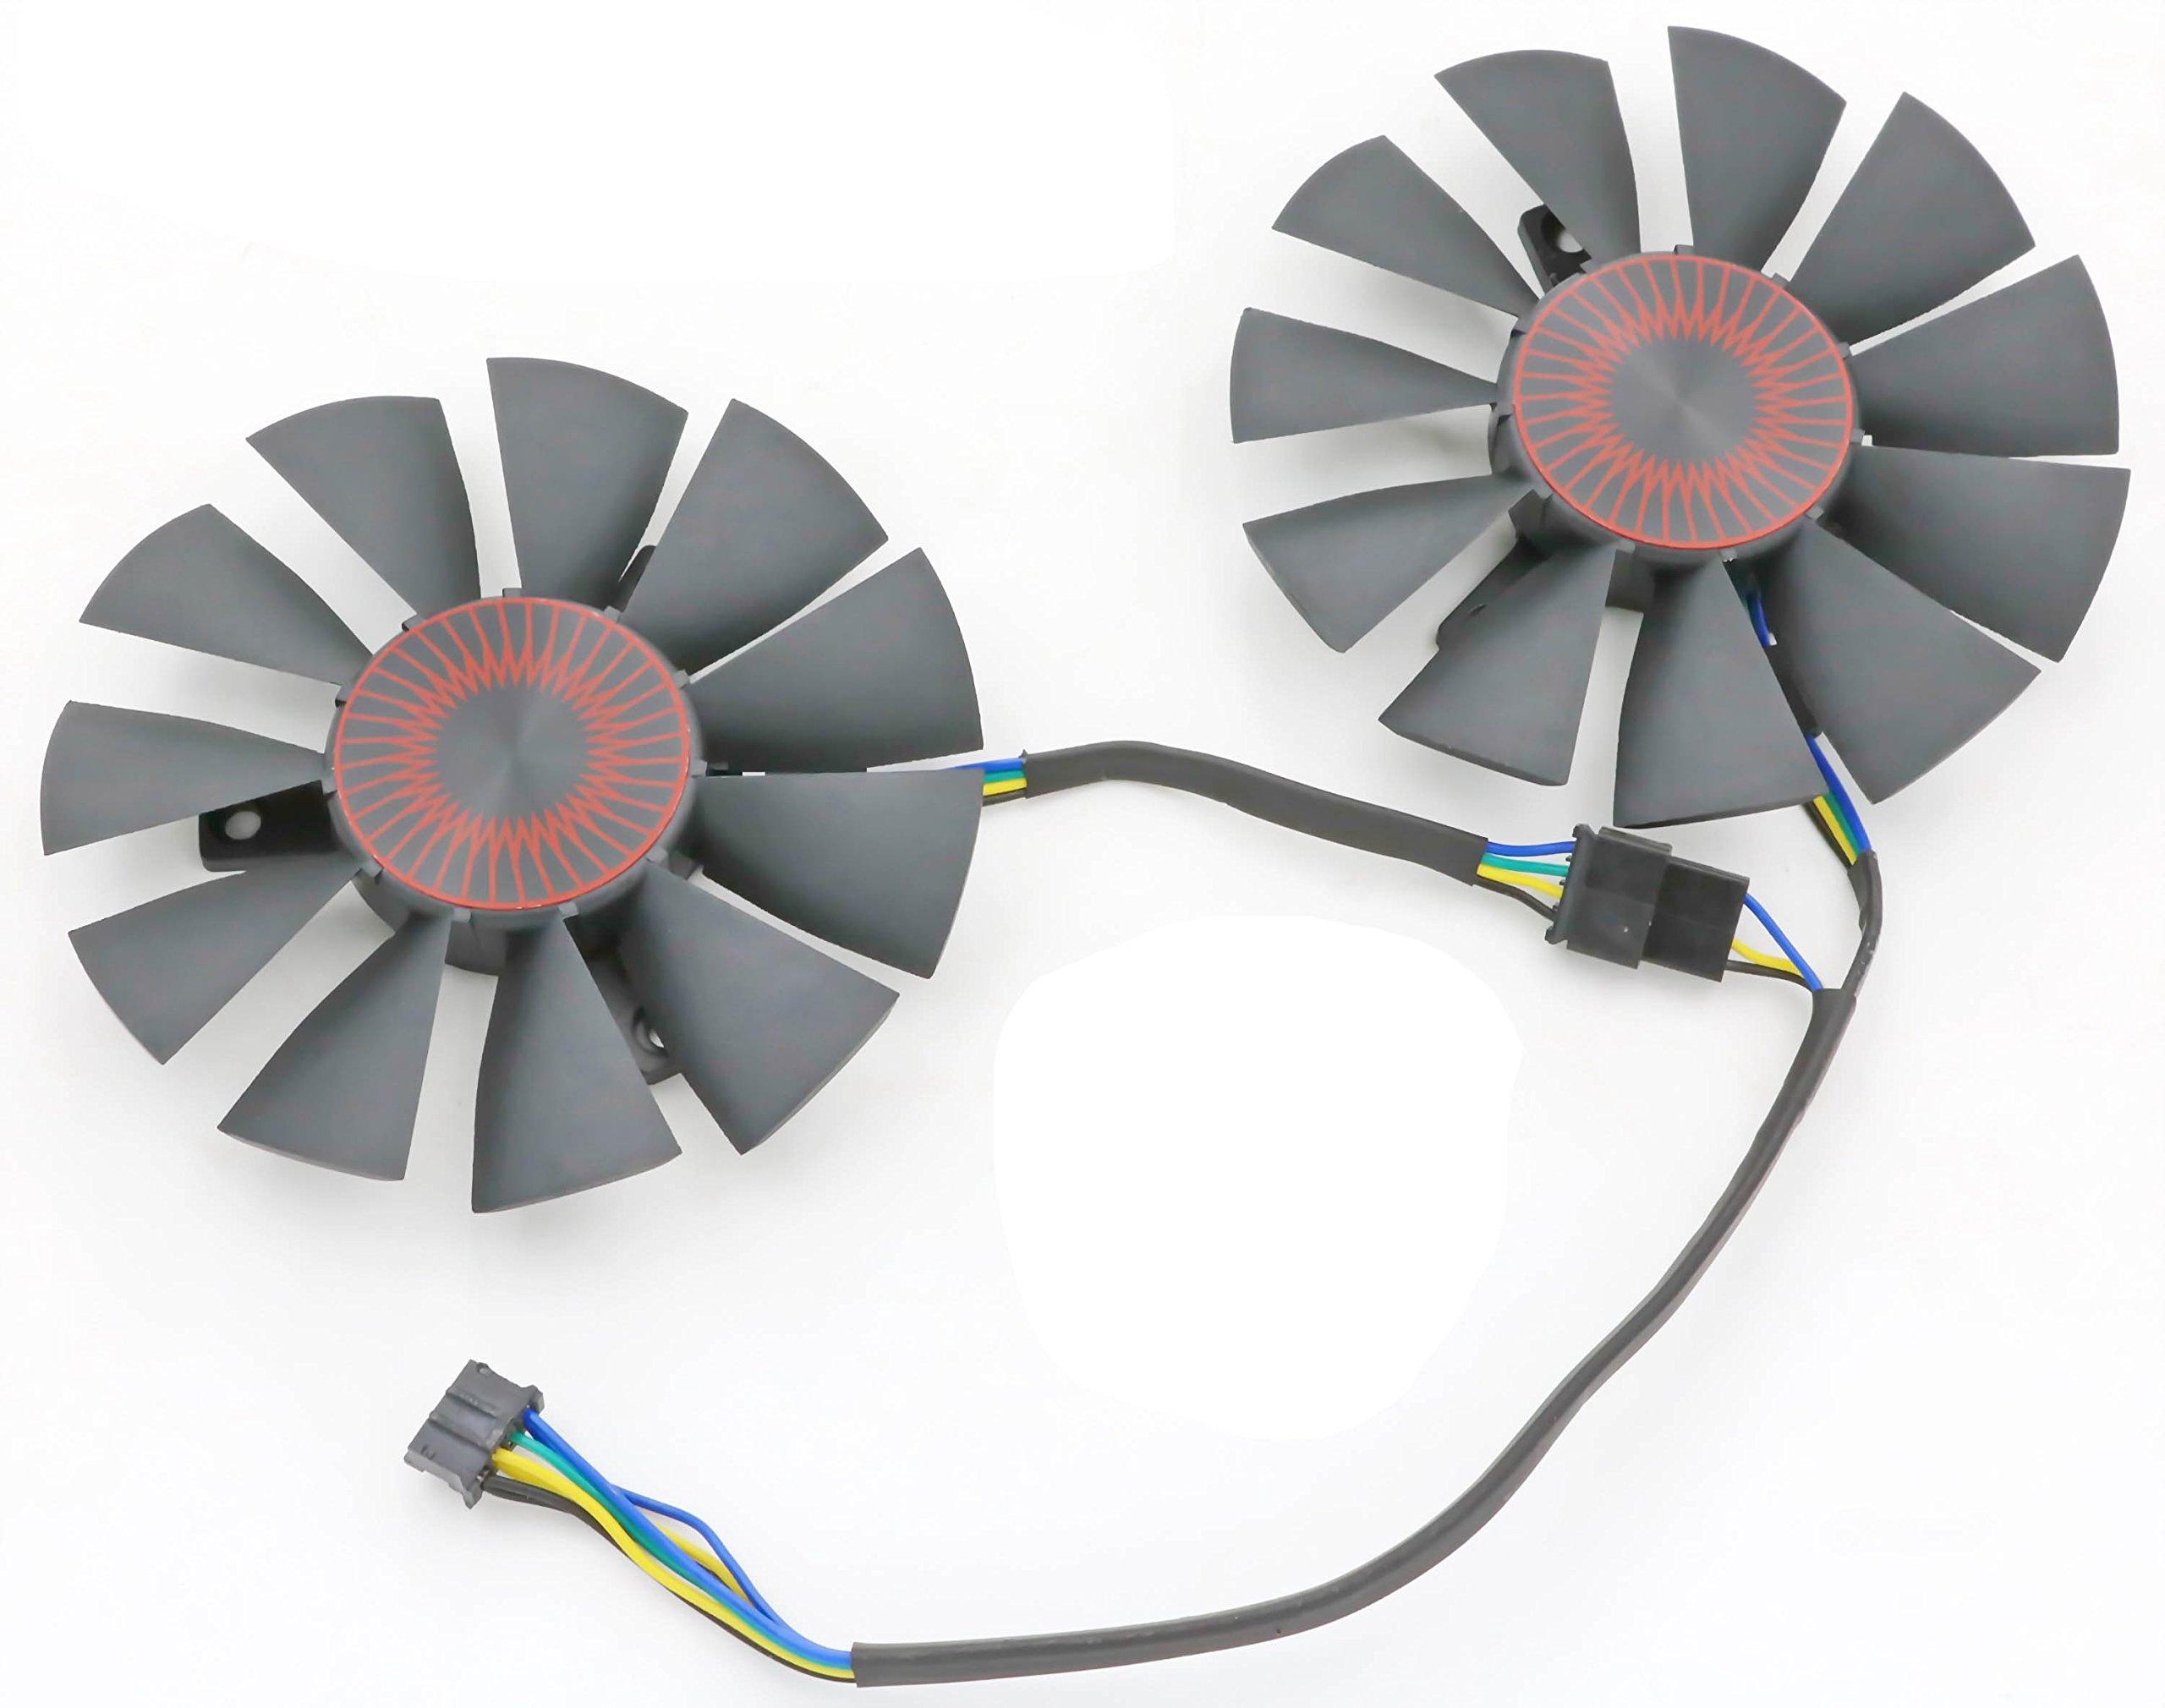 Replacement Video Card Cooling Fan For STRIX GTX 960 GTX950 GTX 750TI R9 370 Graphics Card Fan 75mm 4Pin